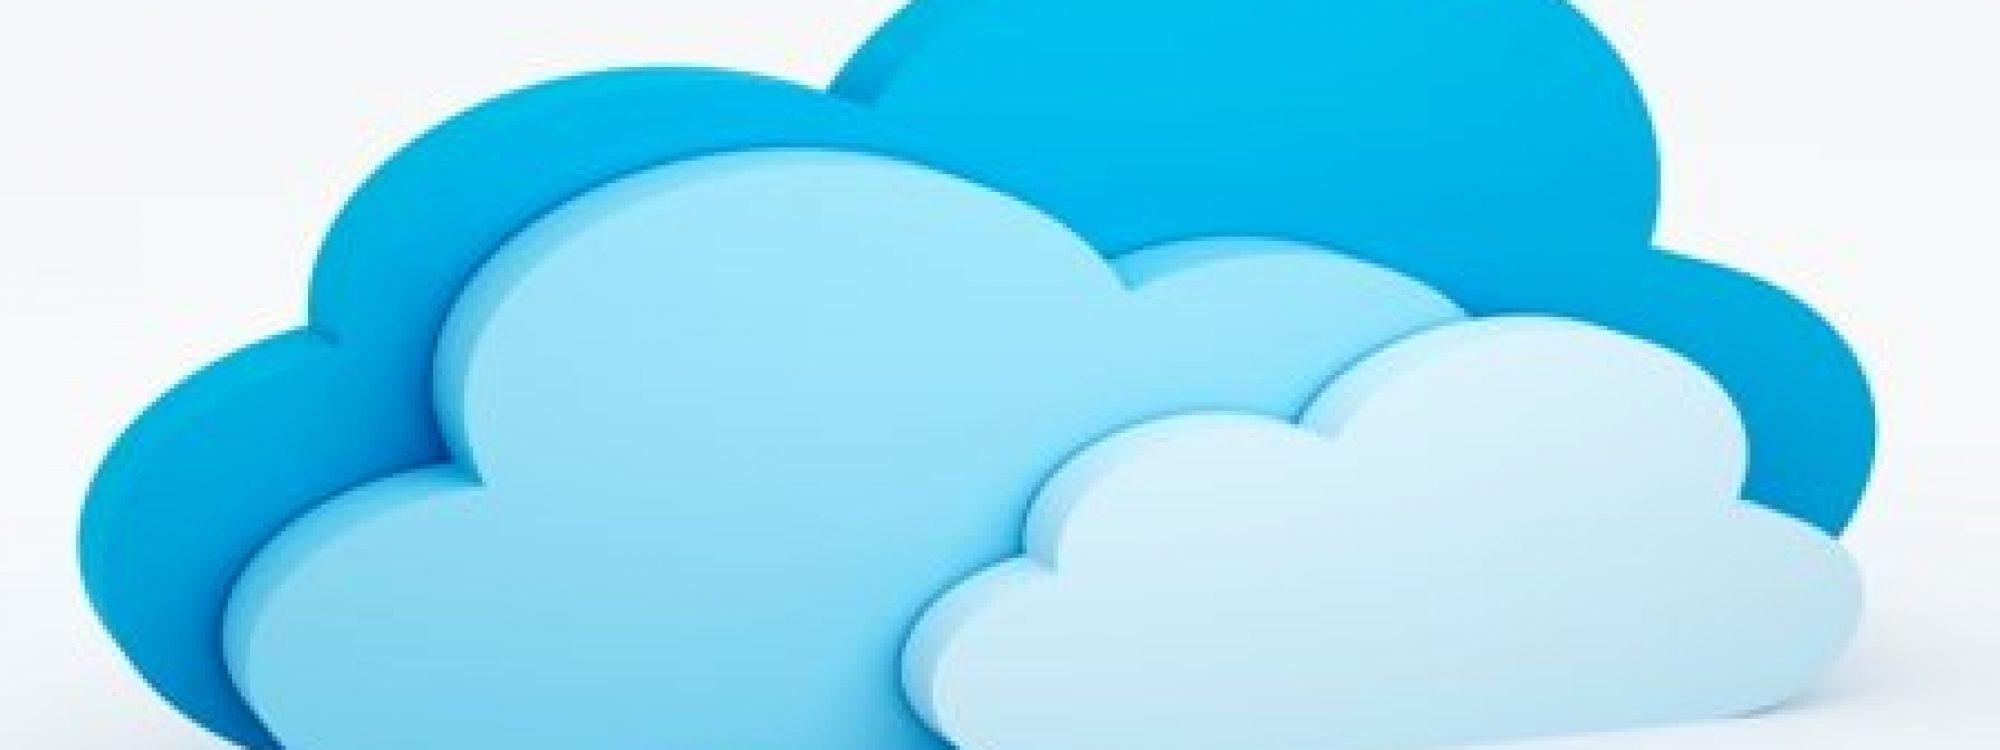 Content Guru Featured in DMG Consulting Cloud Report